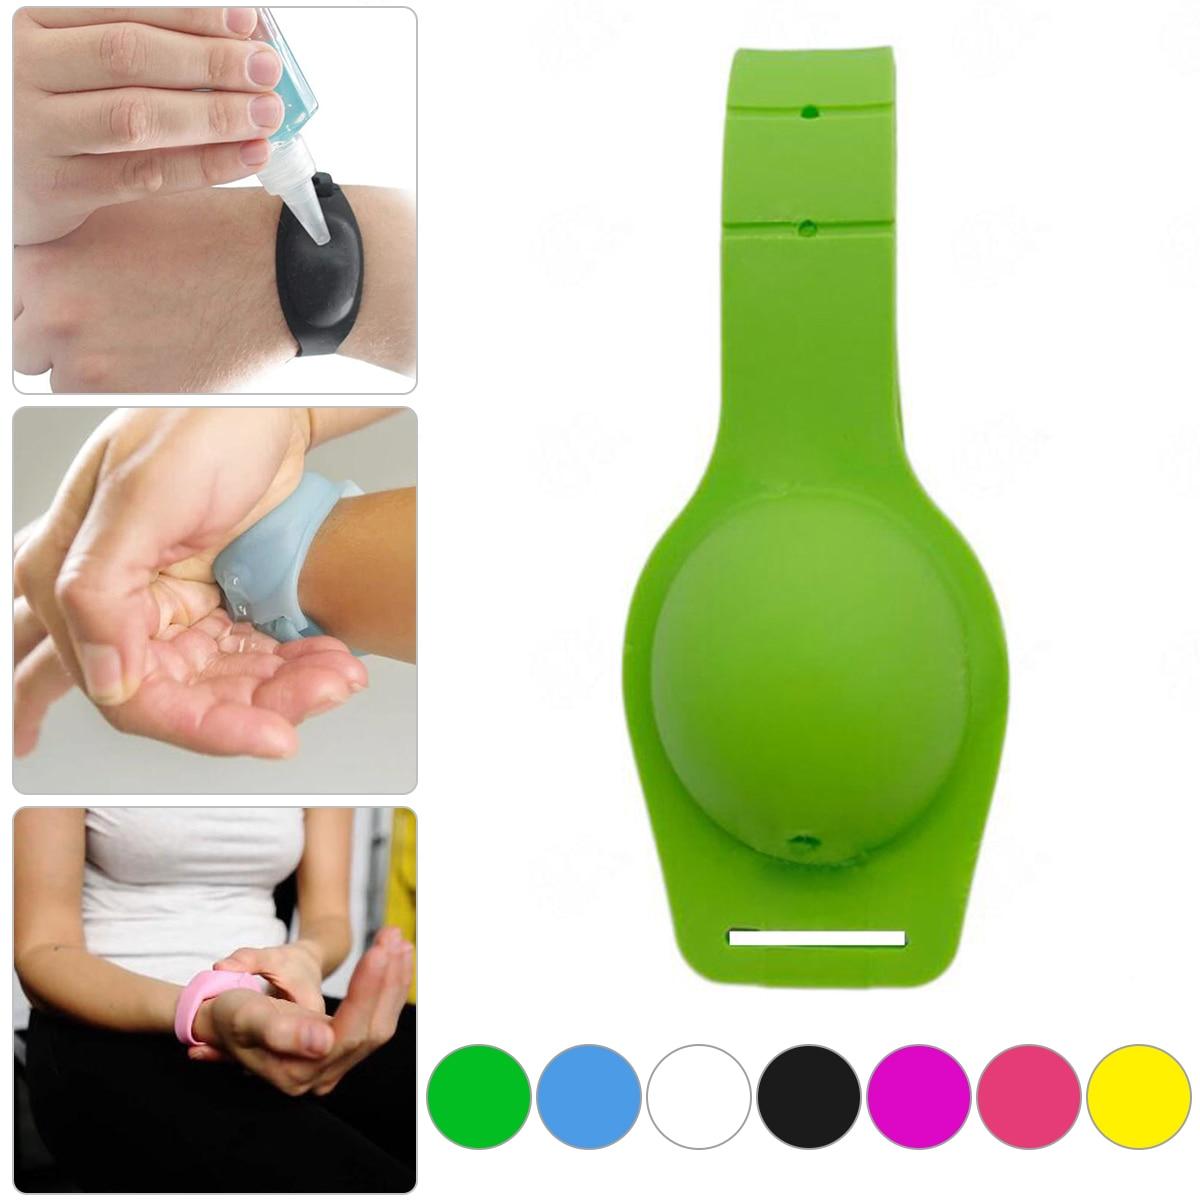 Sanitizer Bracelet Pumps Disinfectant Hand Sanitizer Dispensing Portable Silicone Bracelet Wristband Hand Dispenser new